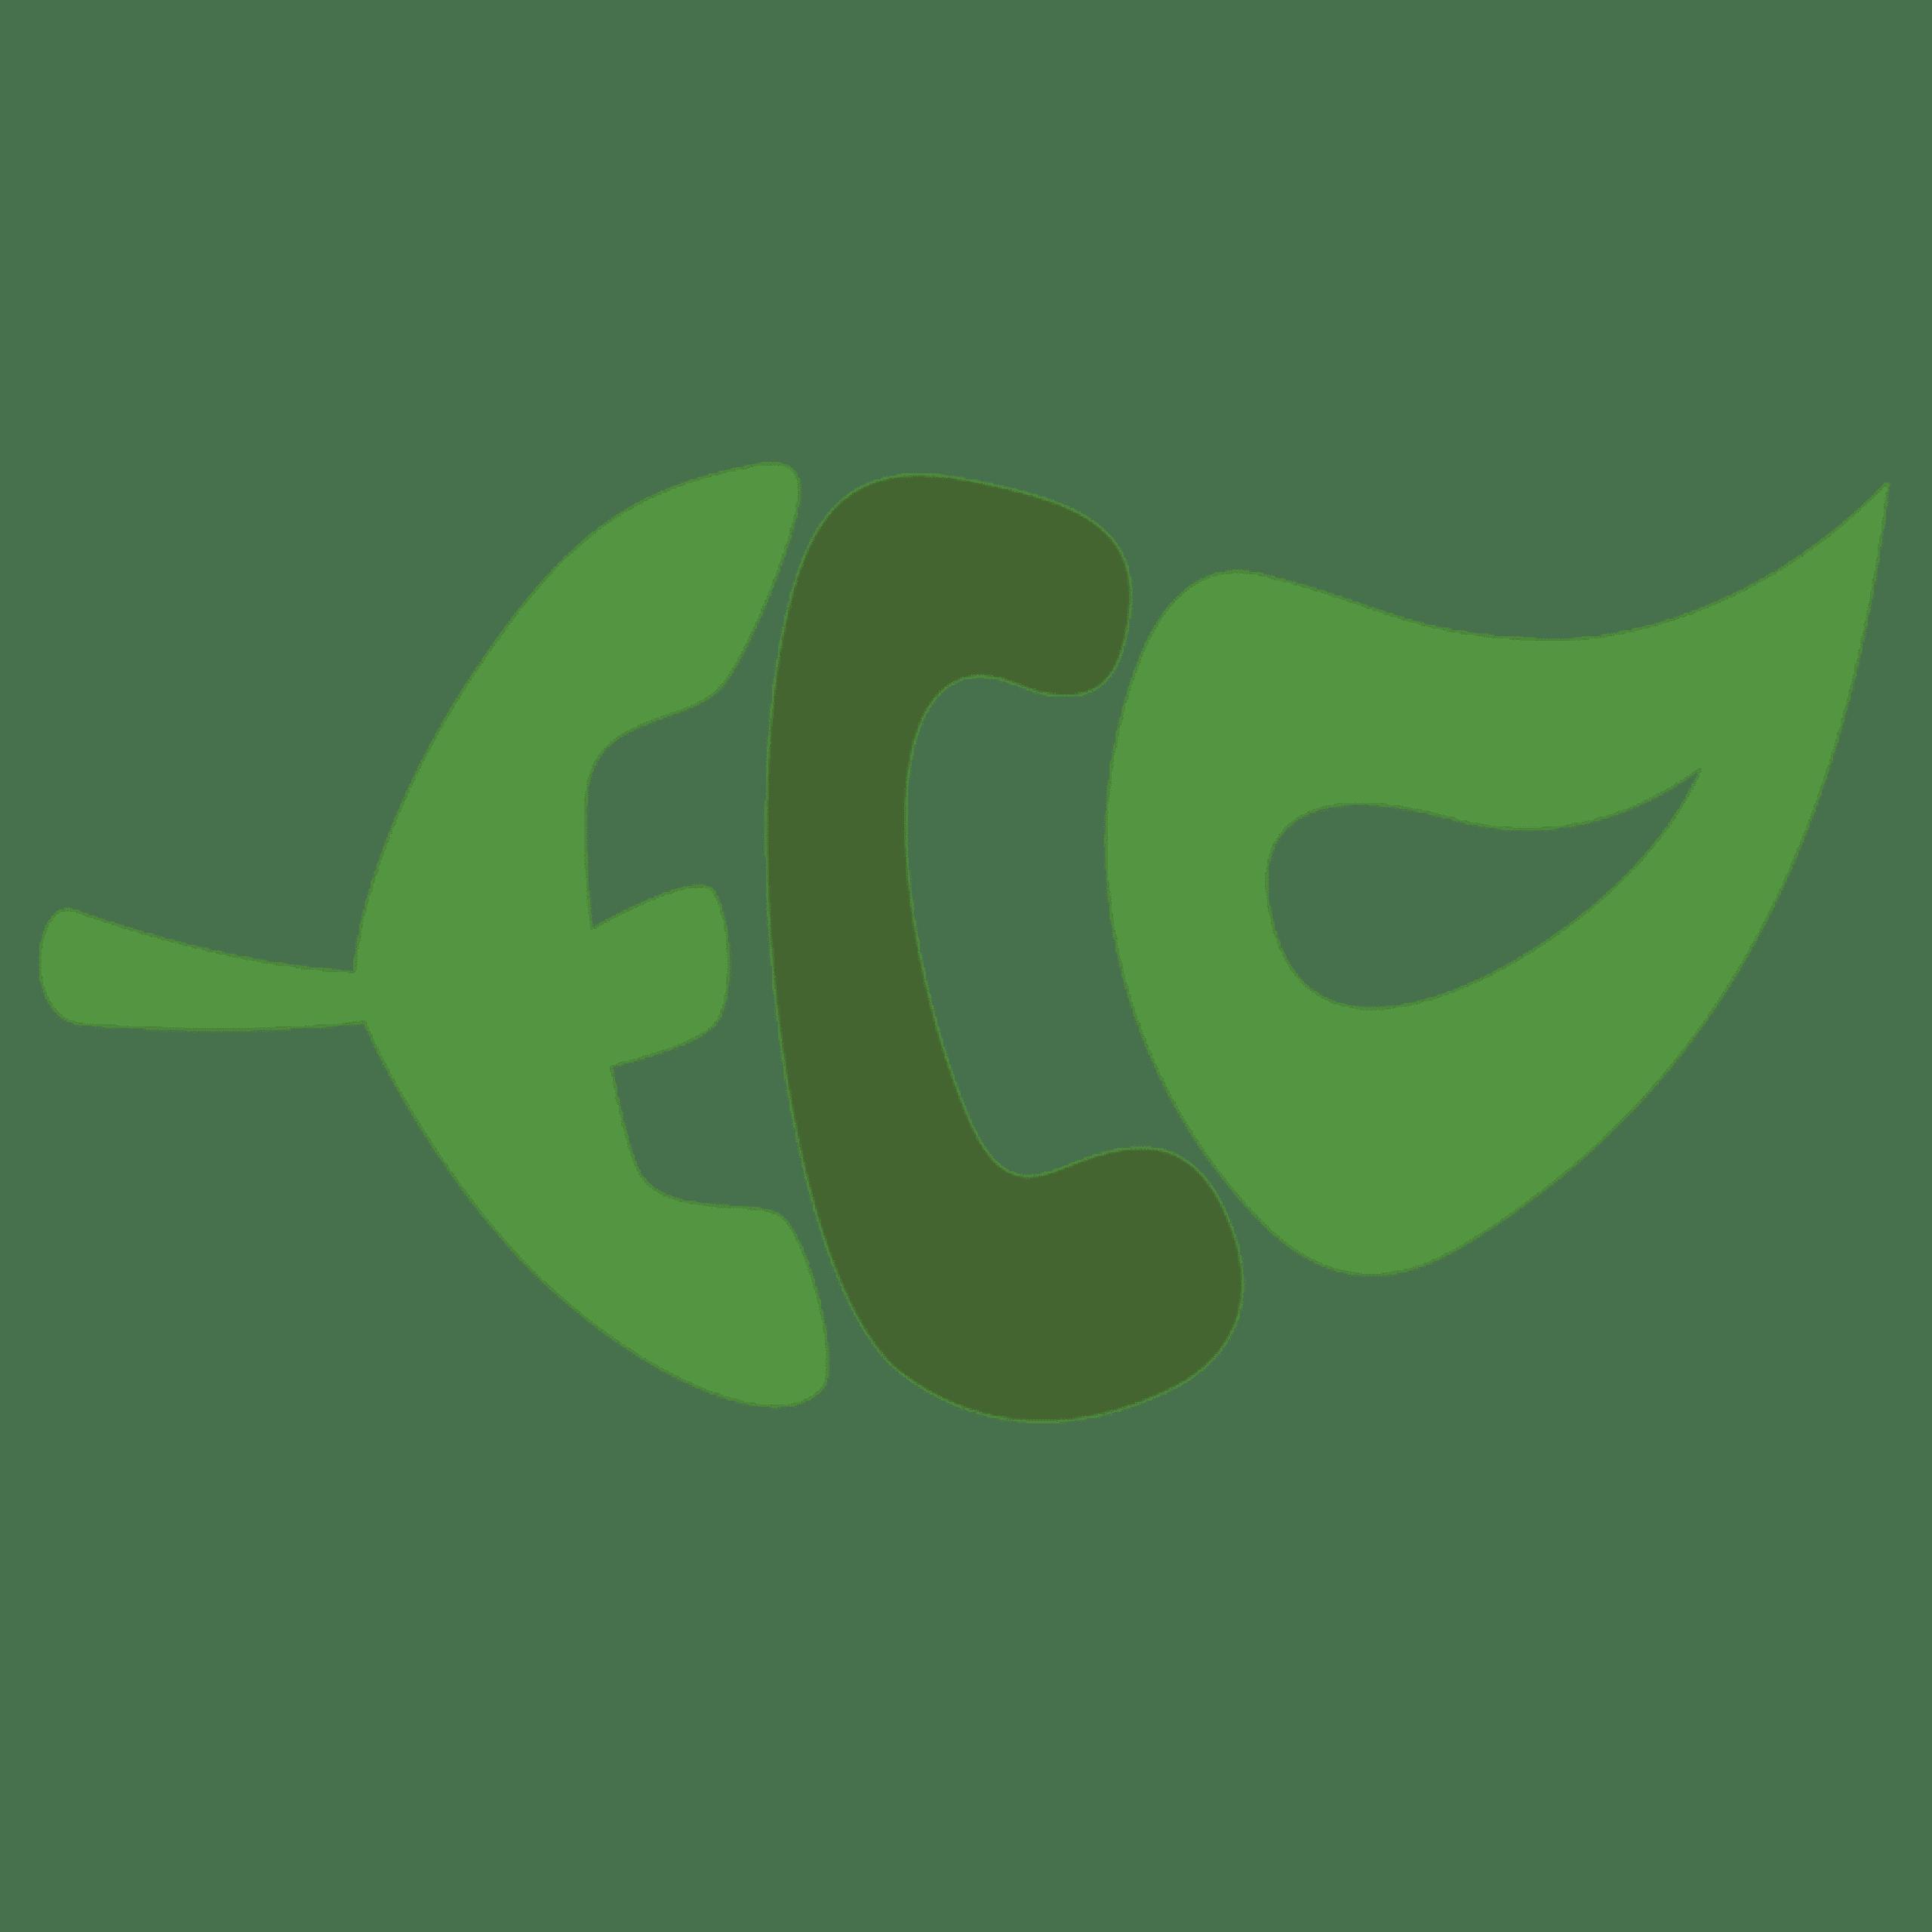 Logo engagements ecologie environnement